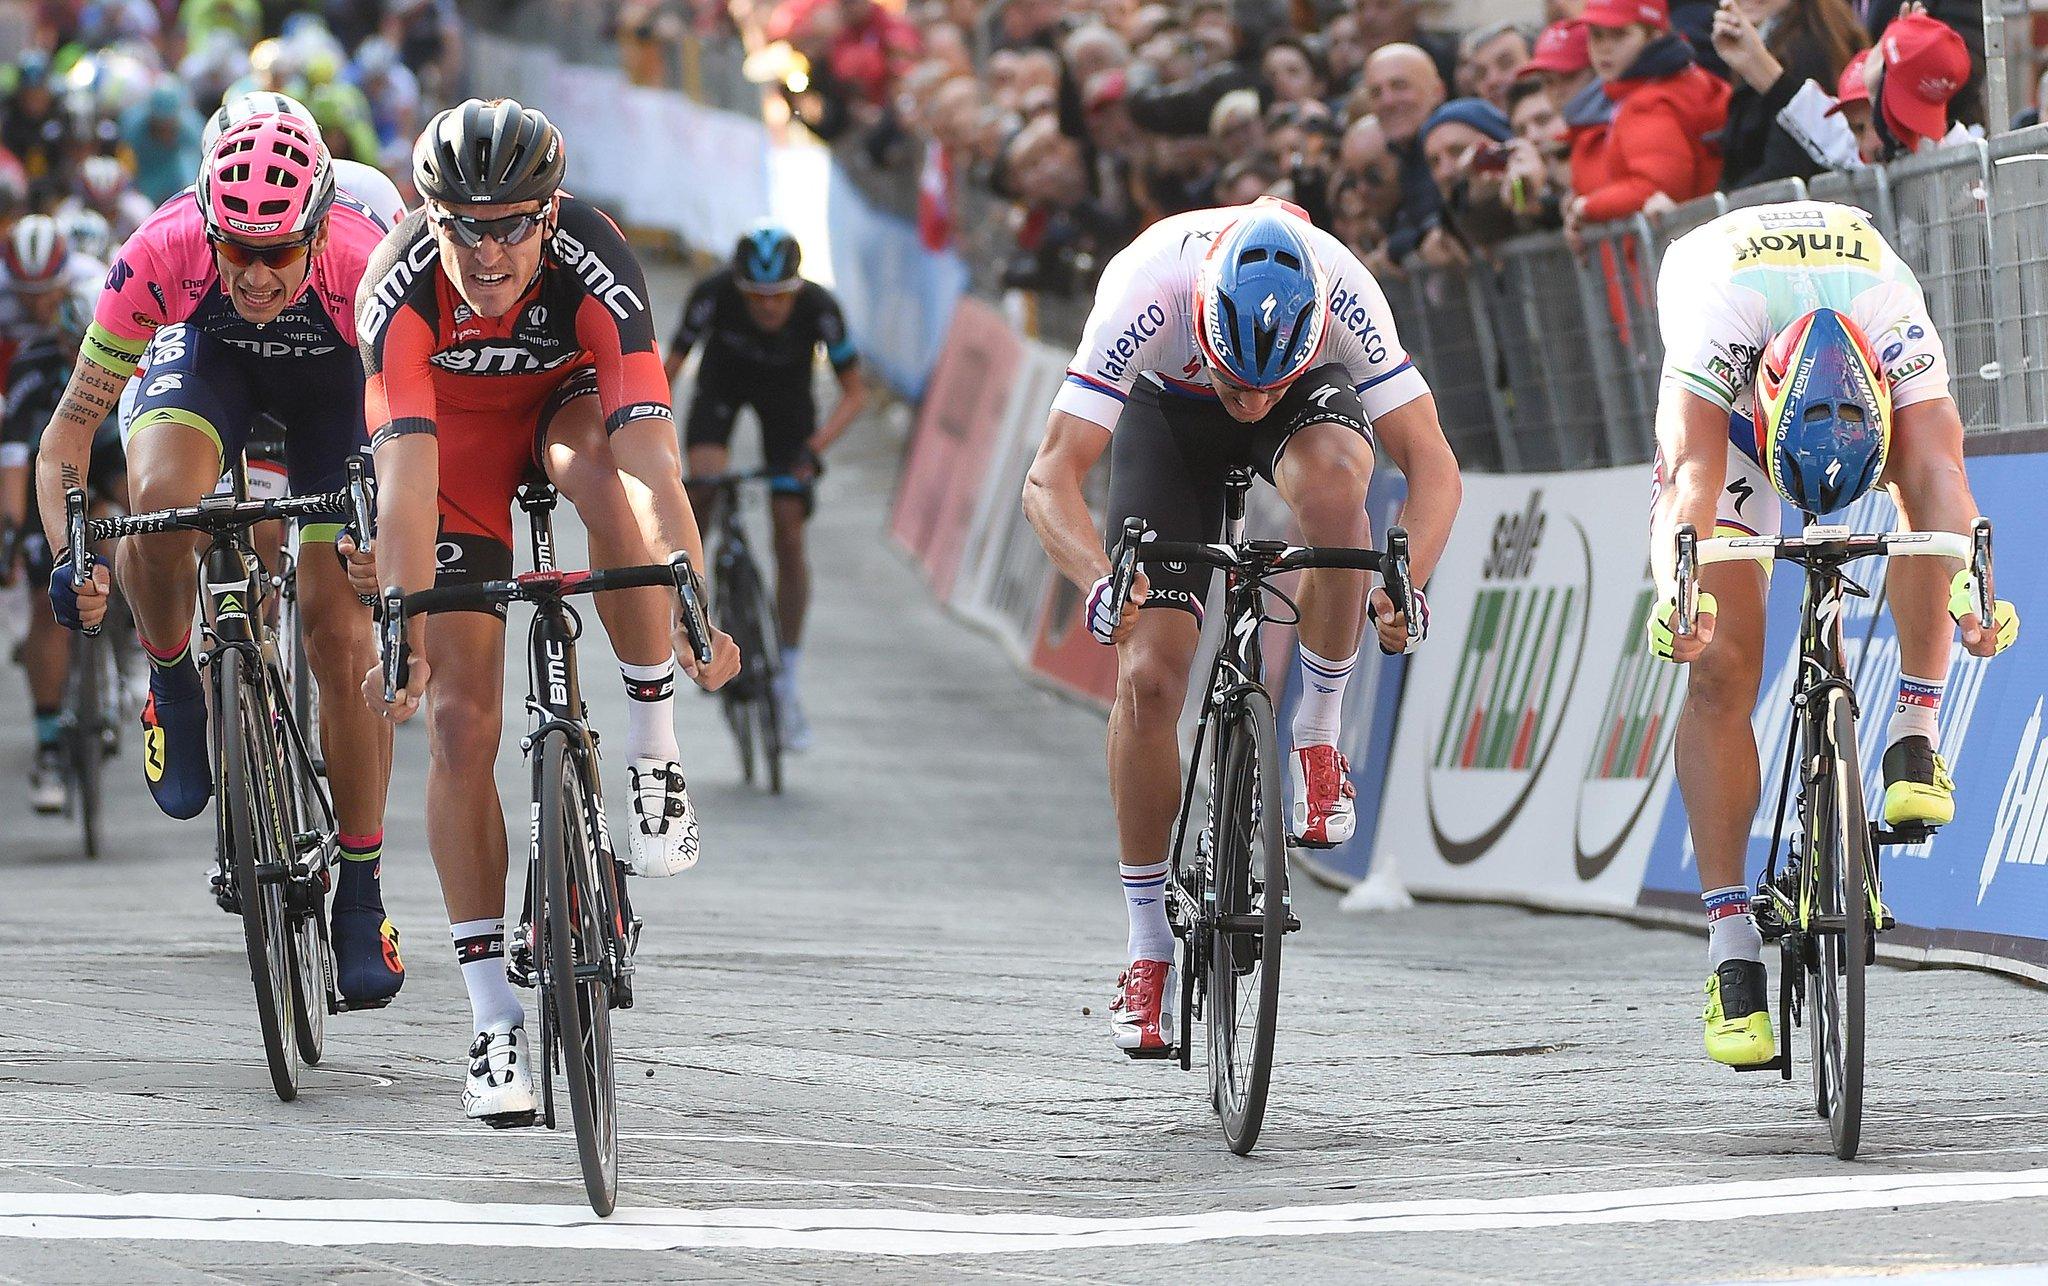 RT @TirrenAdriatico: What a final for @GregVanAvermaet!  Che finale per @GregVanAvermaet!  #Tirreno http://t.co/sdQBvBcGlx